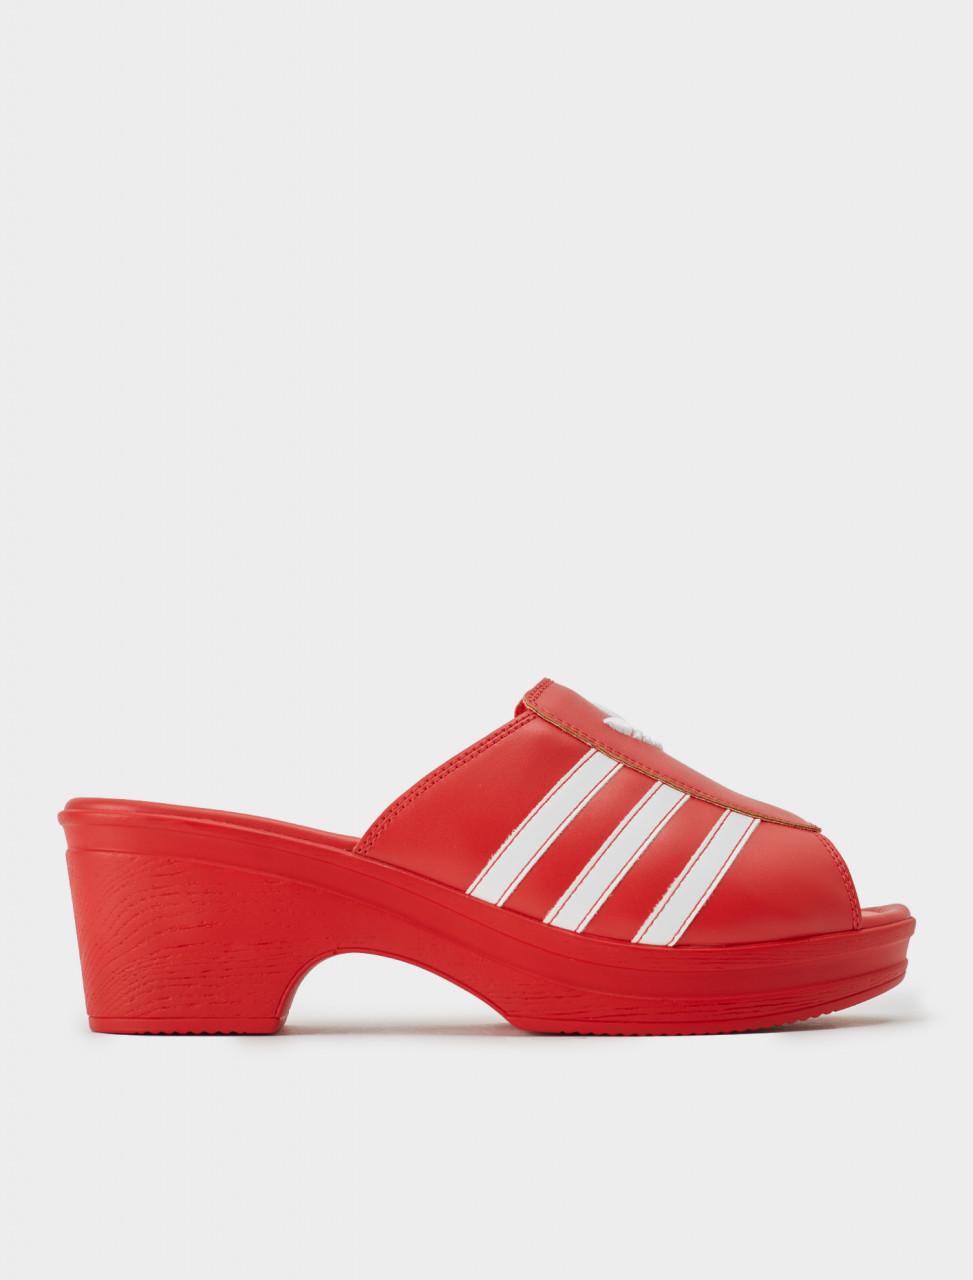 Adidas x Lotta Volkova Trefoil Mule Side